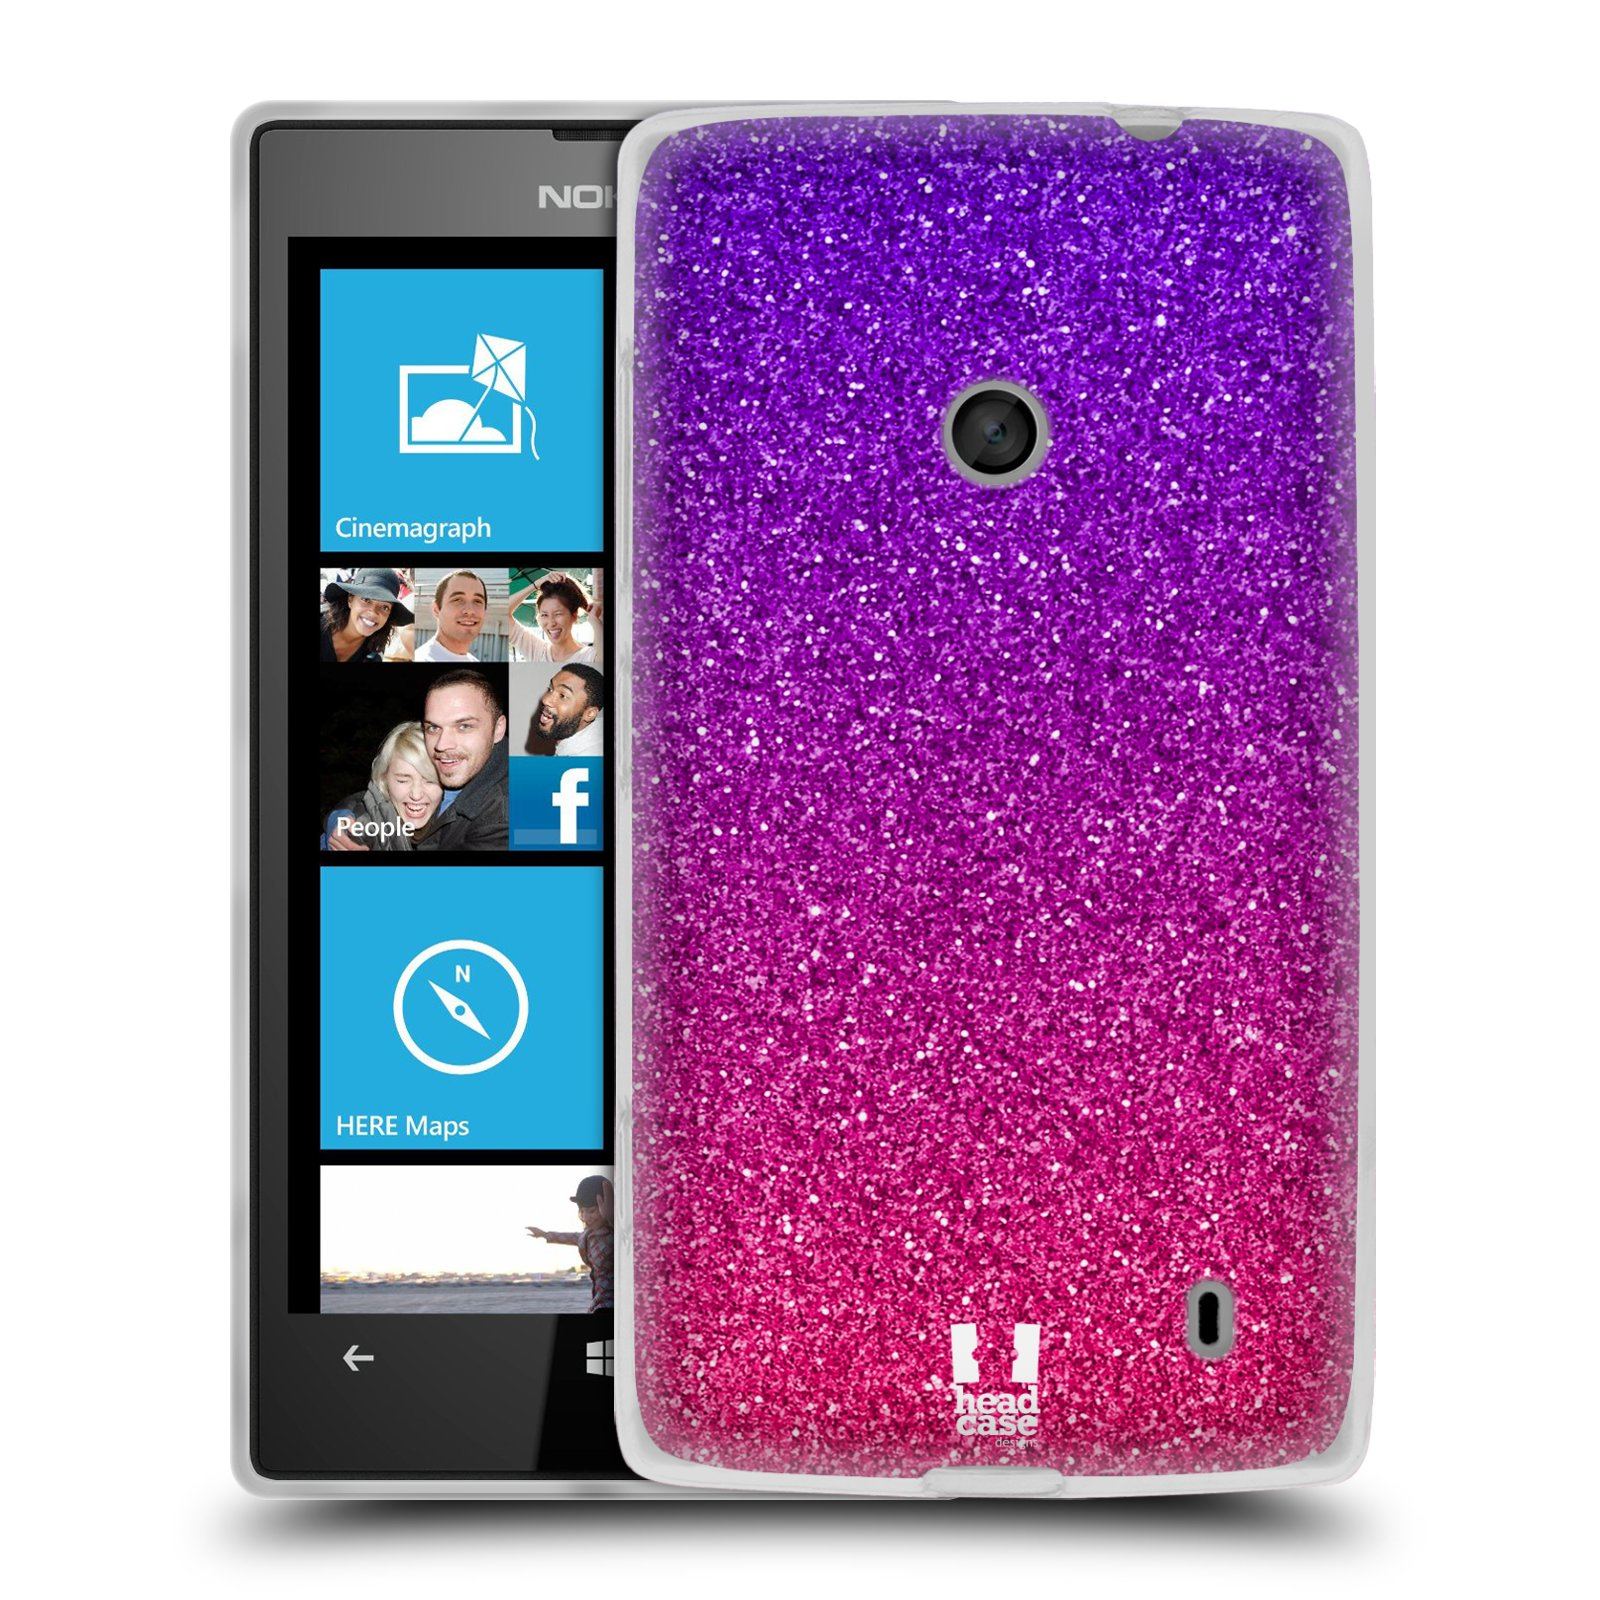 Silikonové pouzdro na mobil Nokia Lumia 520 HEAD CASE MIX PINK (Silikonový Kryt či obal na mobilní telefon Nokia Lumia 520)